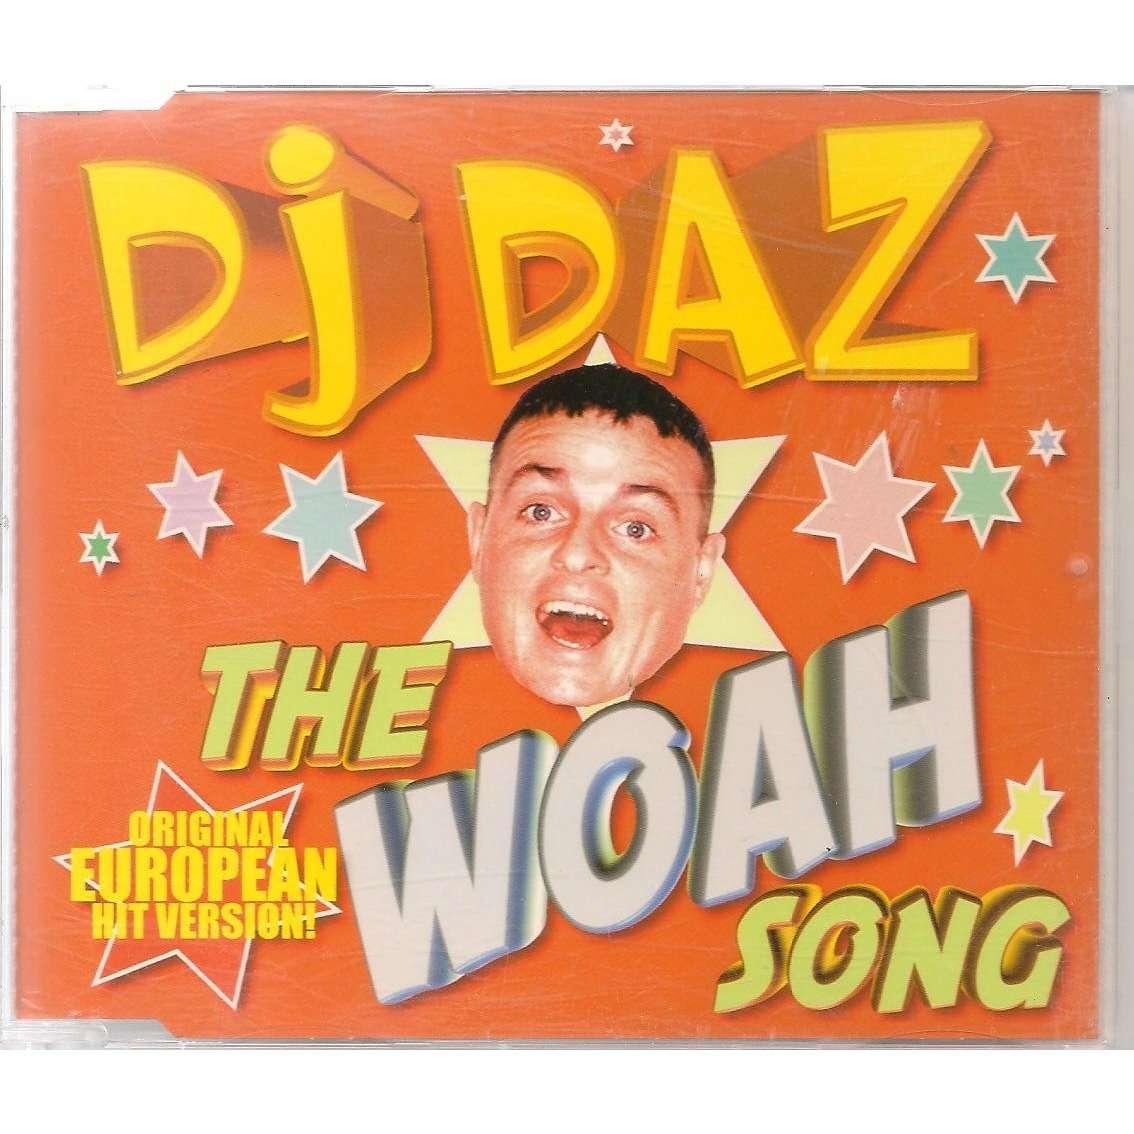 THE WOAH SONG by DJ DAZ, MCD with colaumau